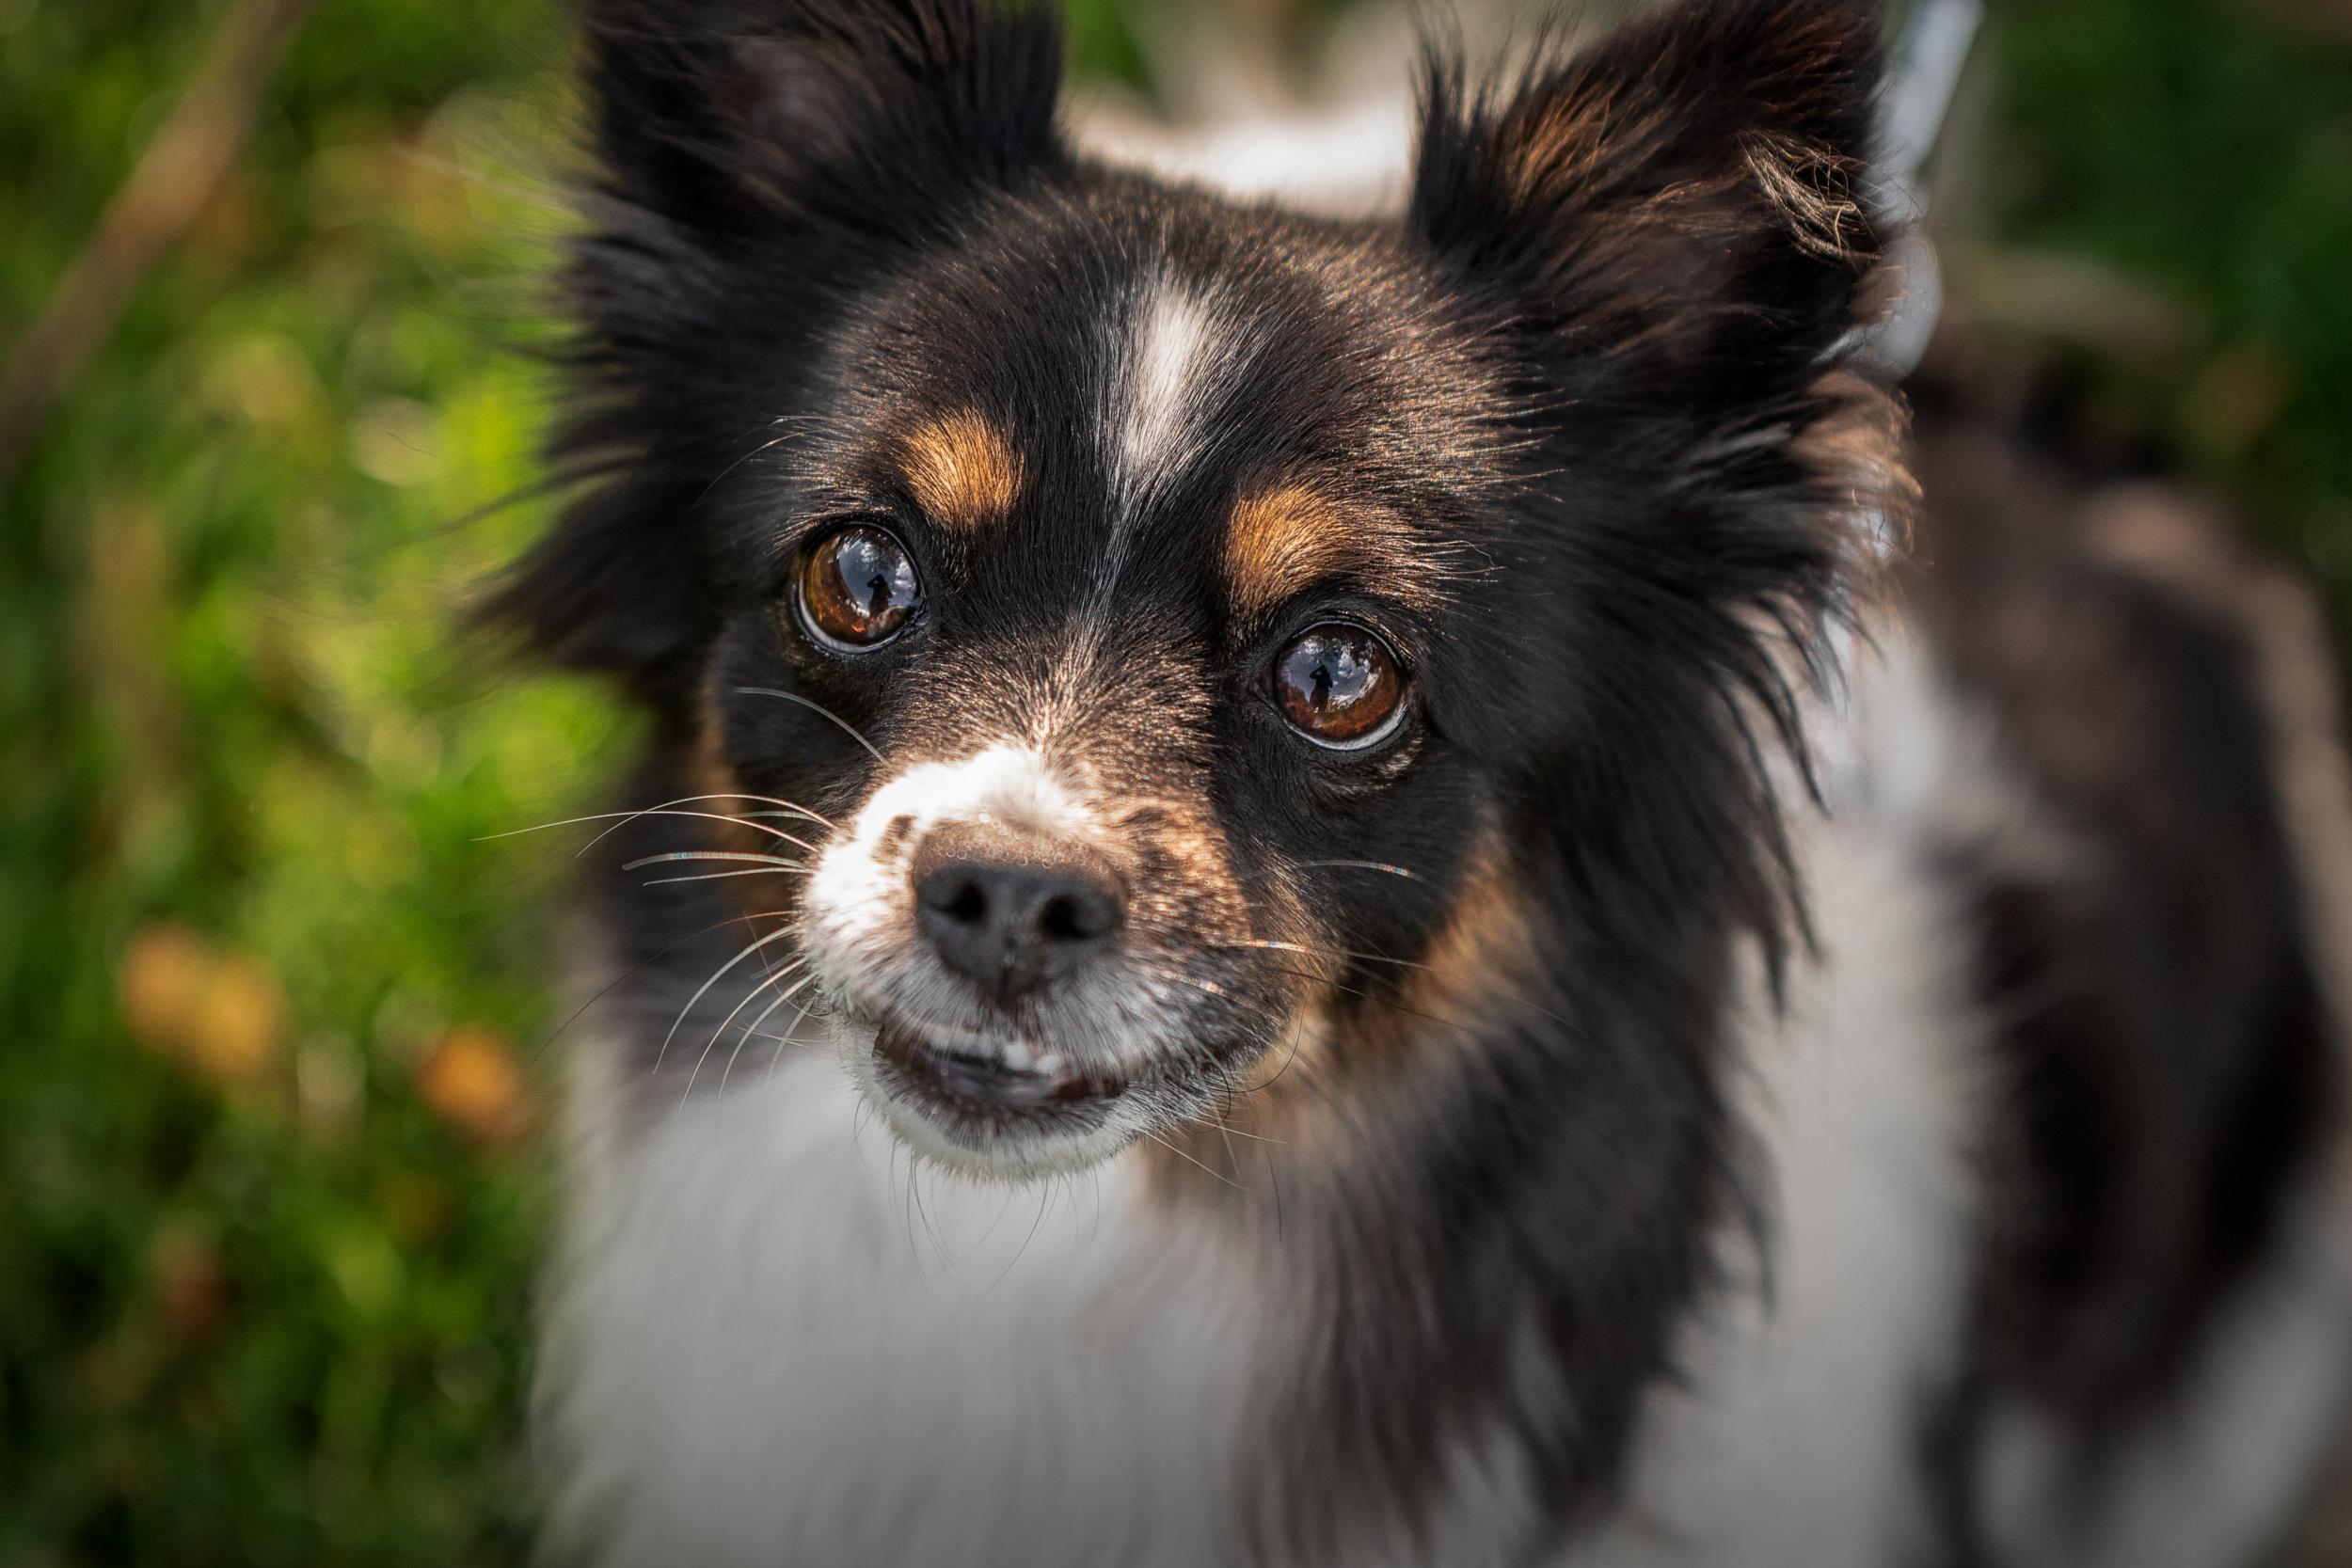 Tiny Dog Body Guard - M's animals Photography